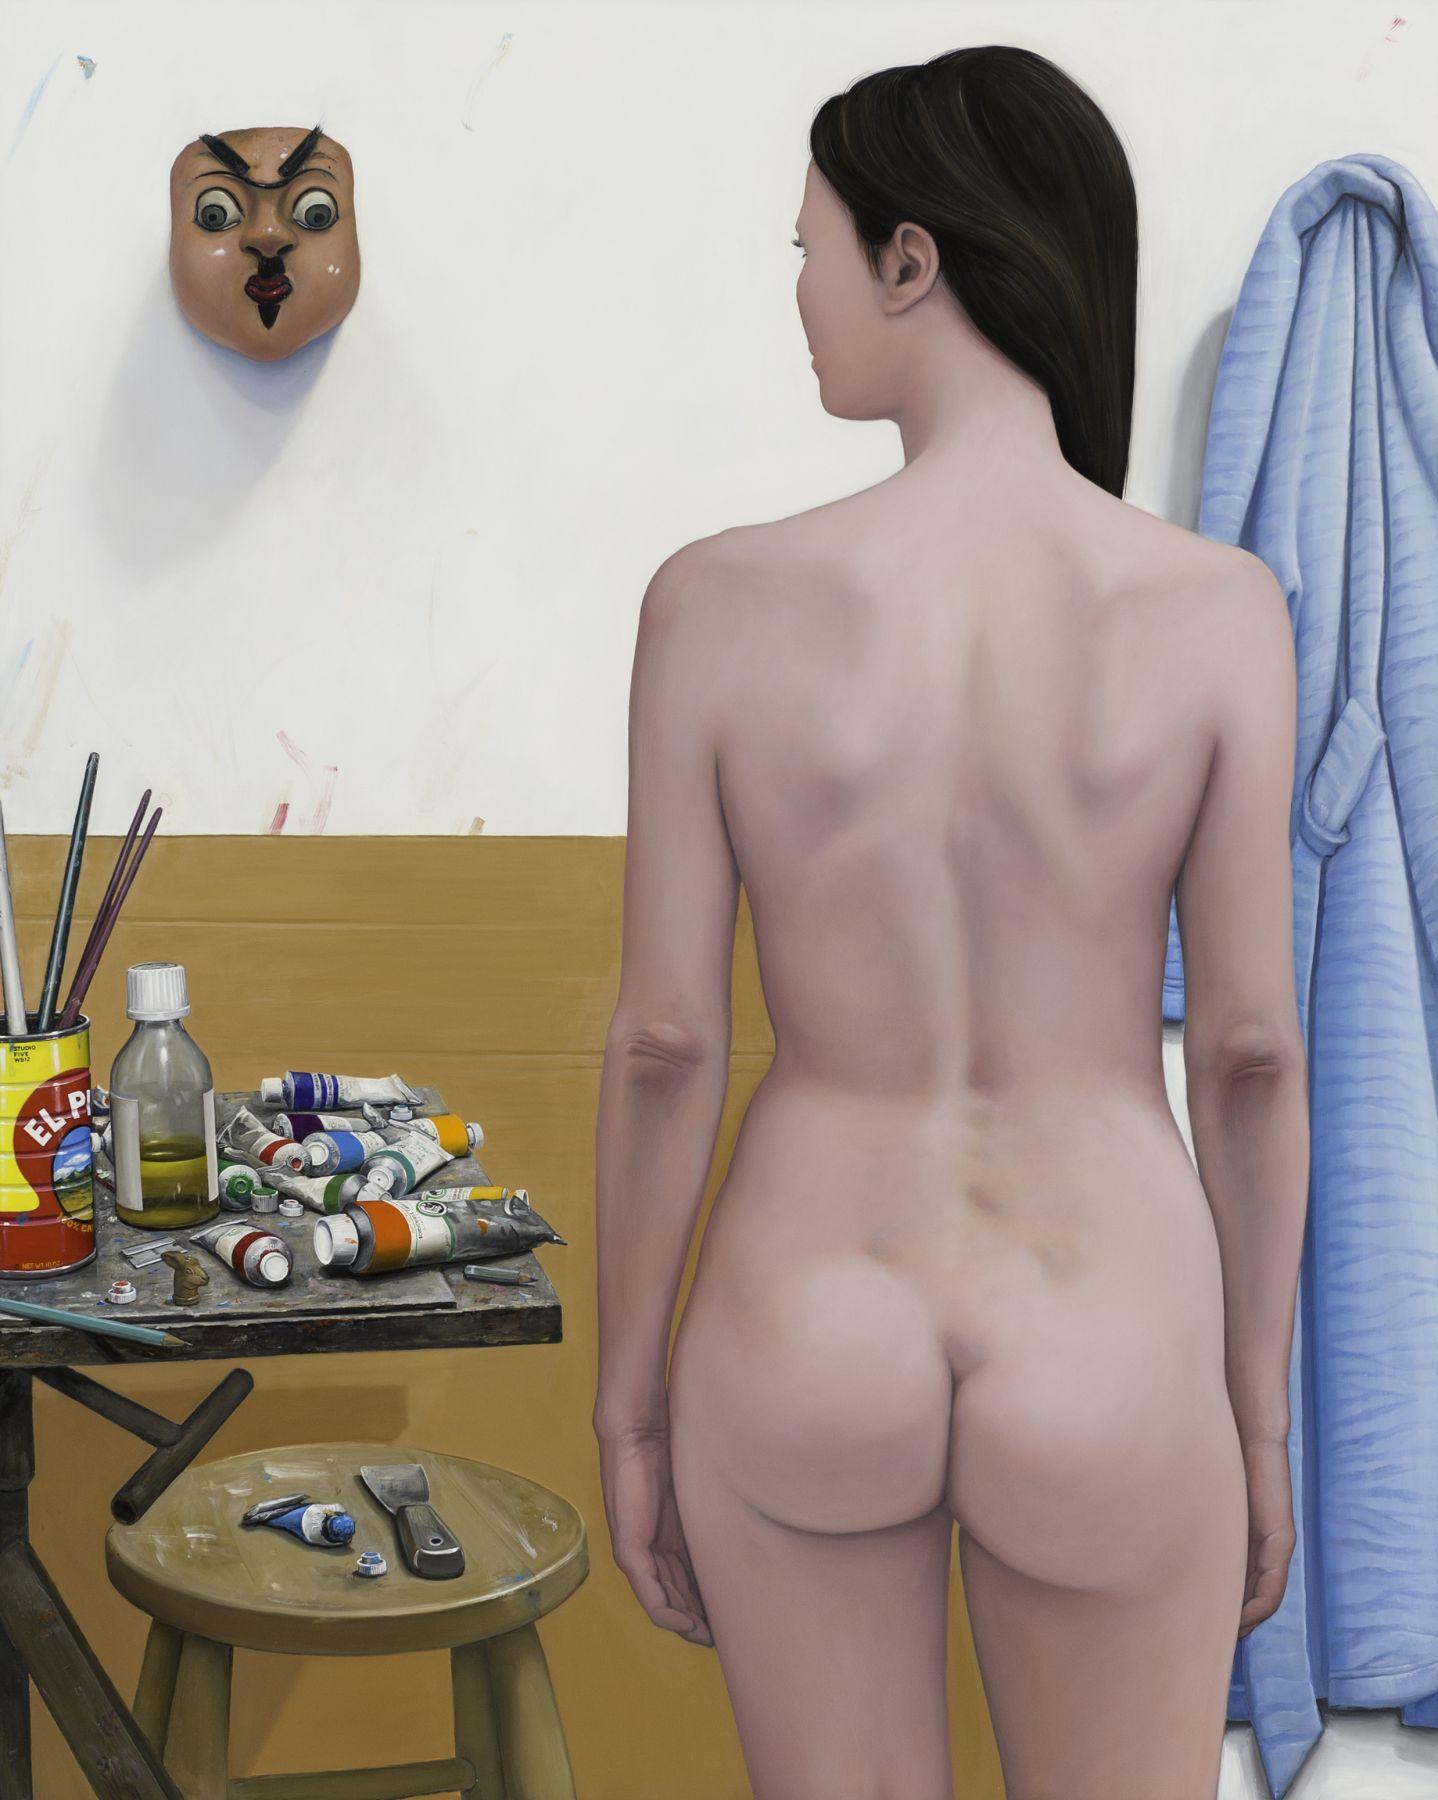 William Beckman, Studio Five, 2010-12, oil on panel, 60 x 49 1/4 inches